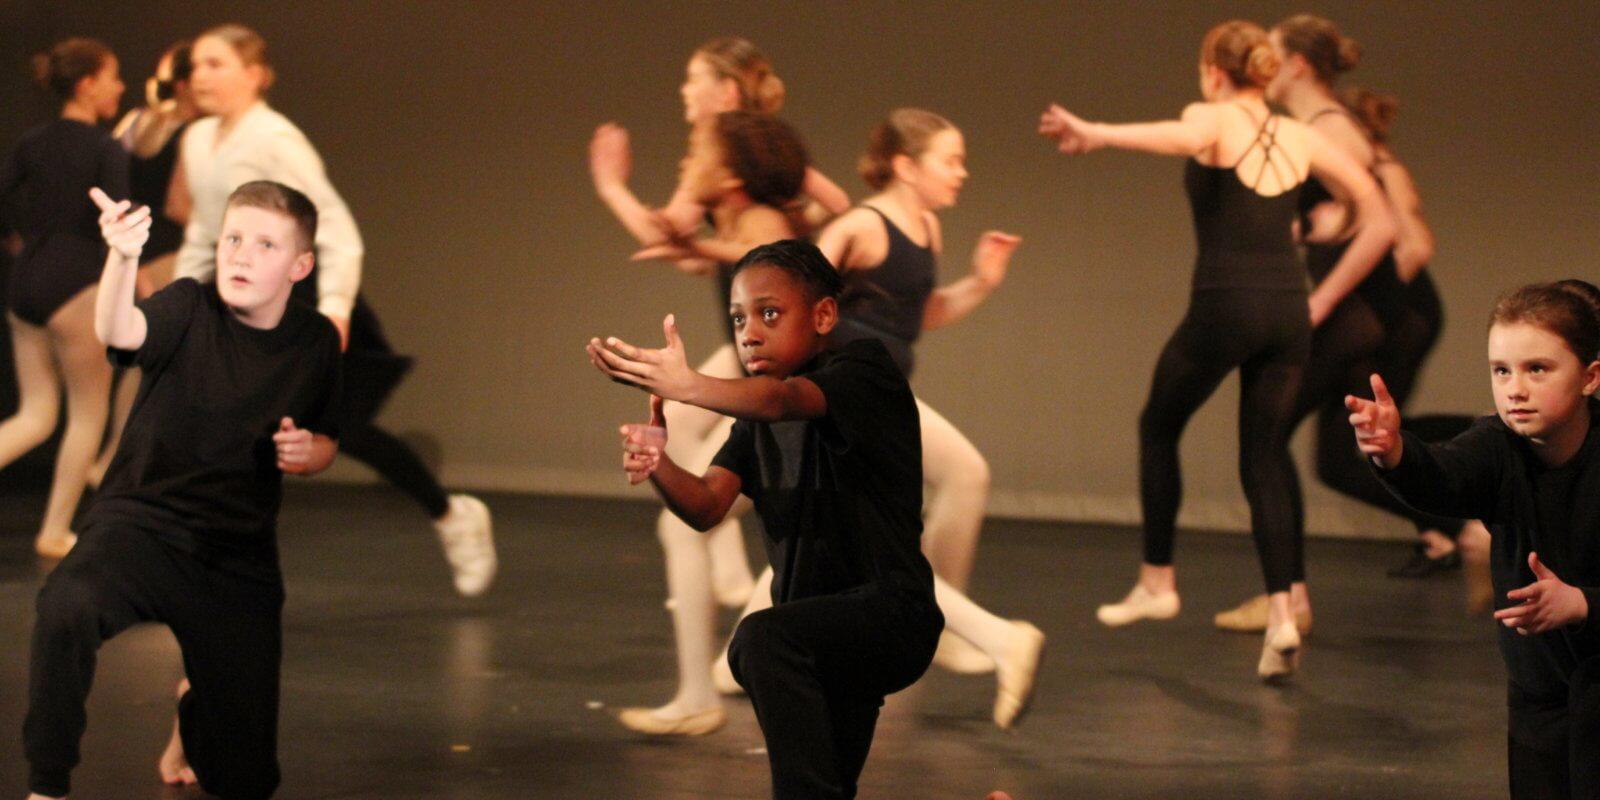 Arts1 Gallery: Dare to Dance 'RAD Centenary Celebration' 15